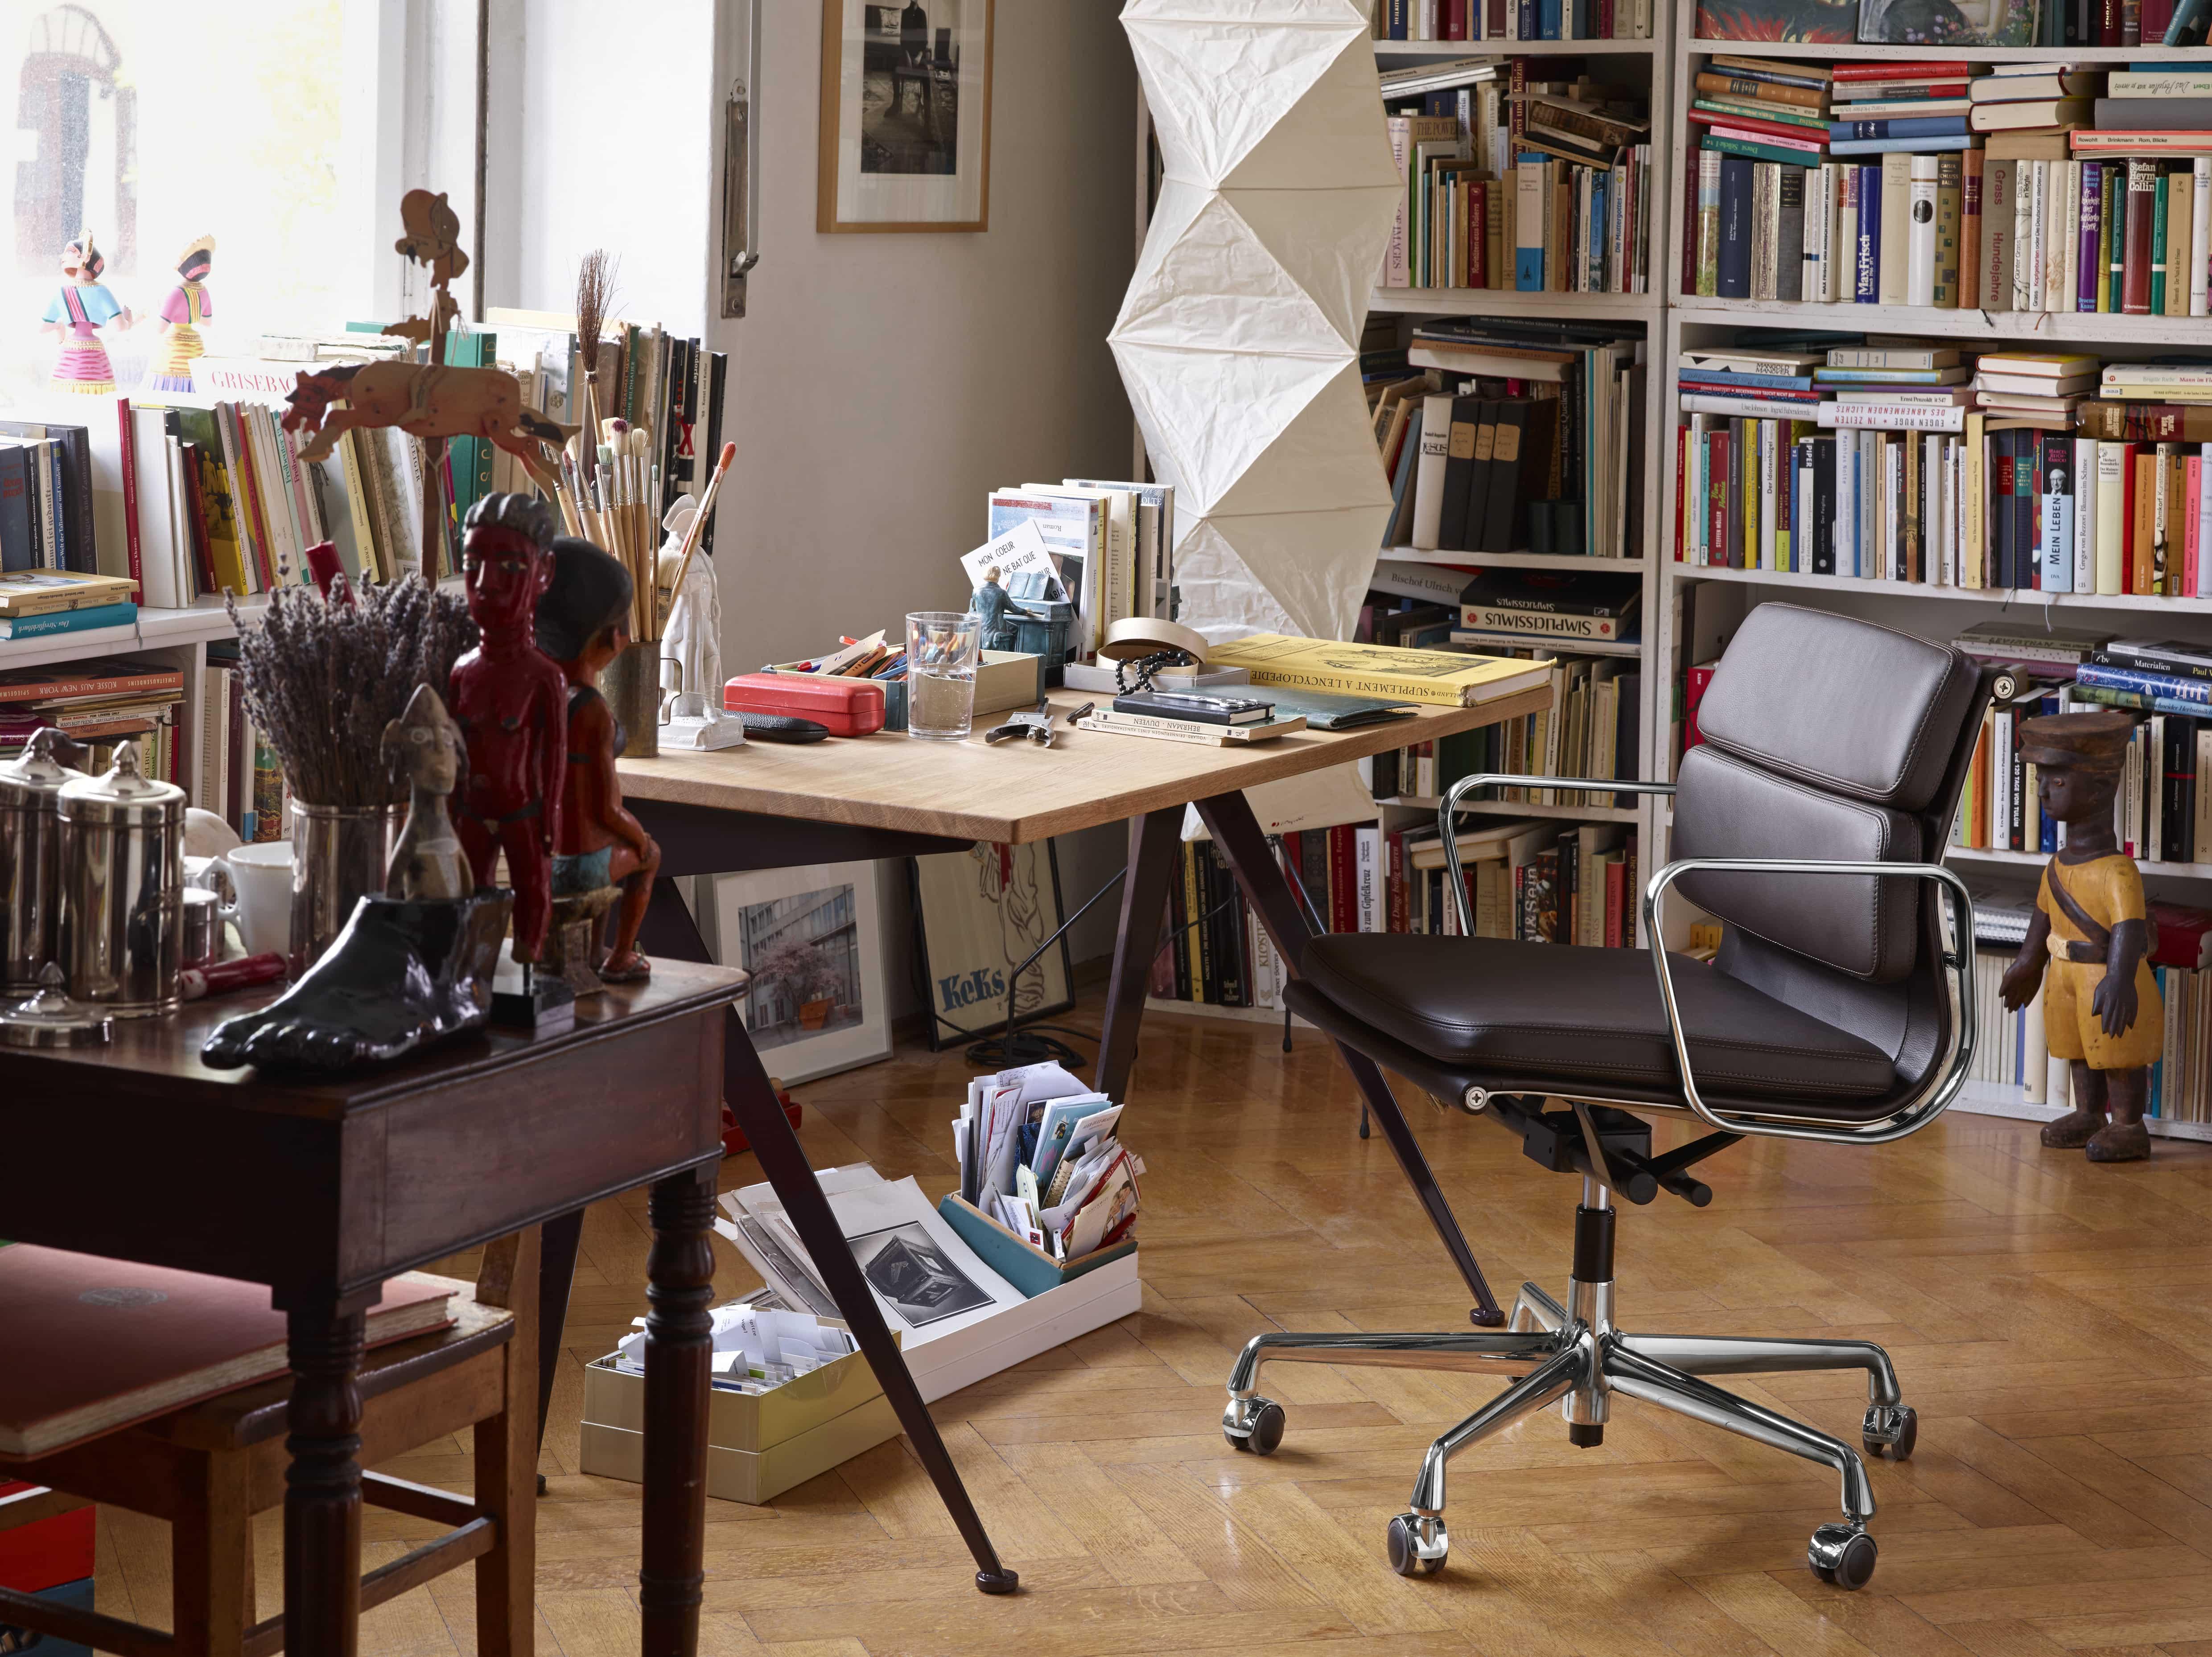 886245_Soft-Pad-Chair-EA-217-Compas-Direction-Akari-UF4-L8_P_masterSvqdKy4fie85A